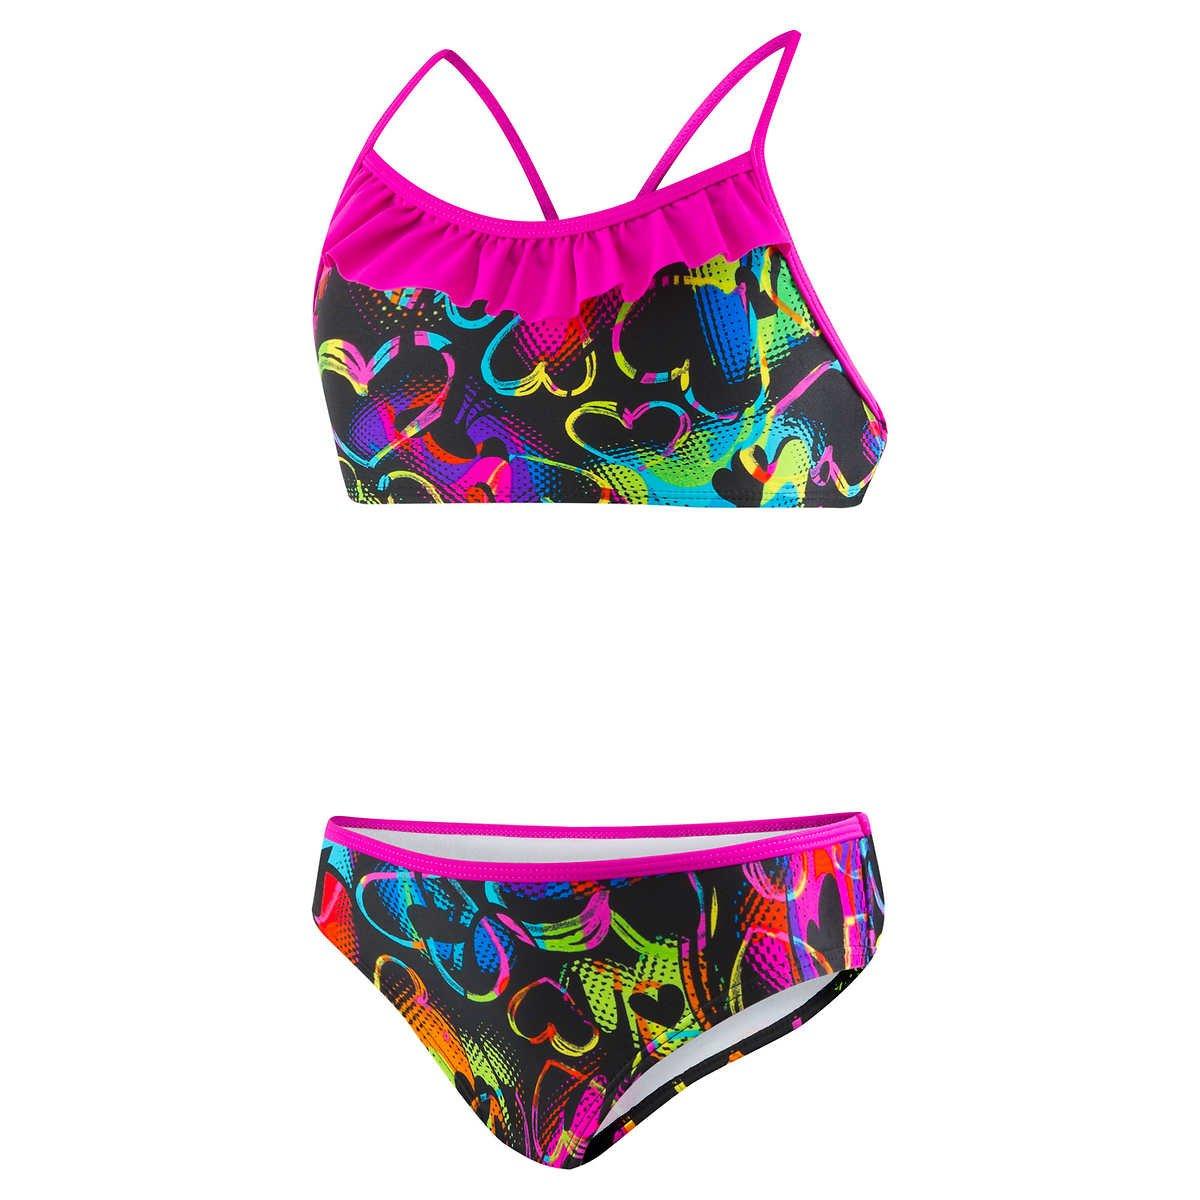 Speedo Girl/'s 2 Pc Racerback Swimsuit Hearts Black Neon Bikini Sz 6 thru 16